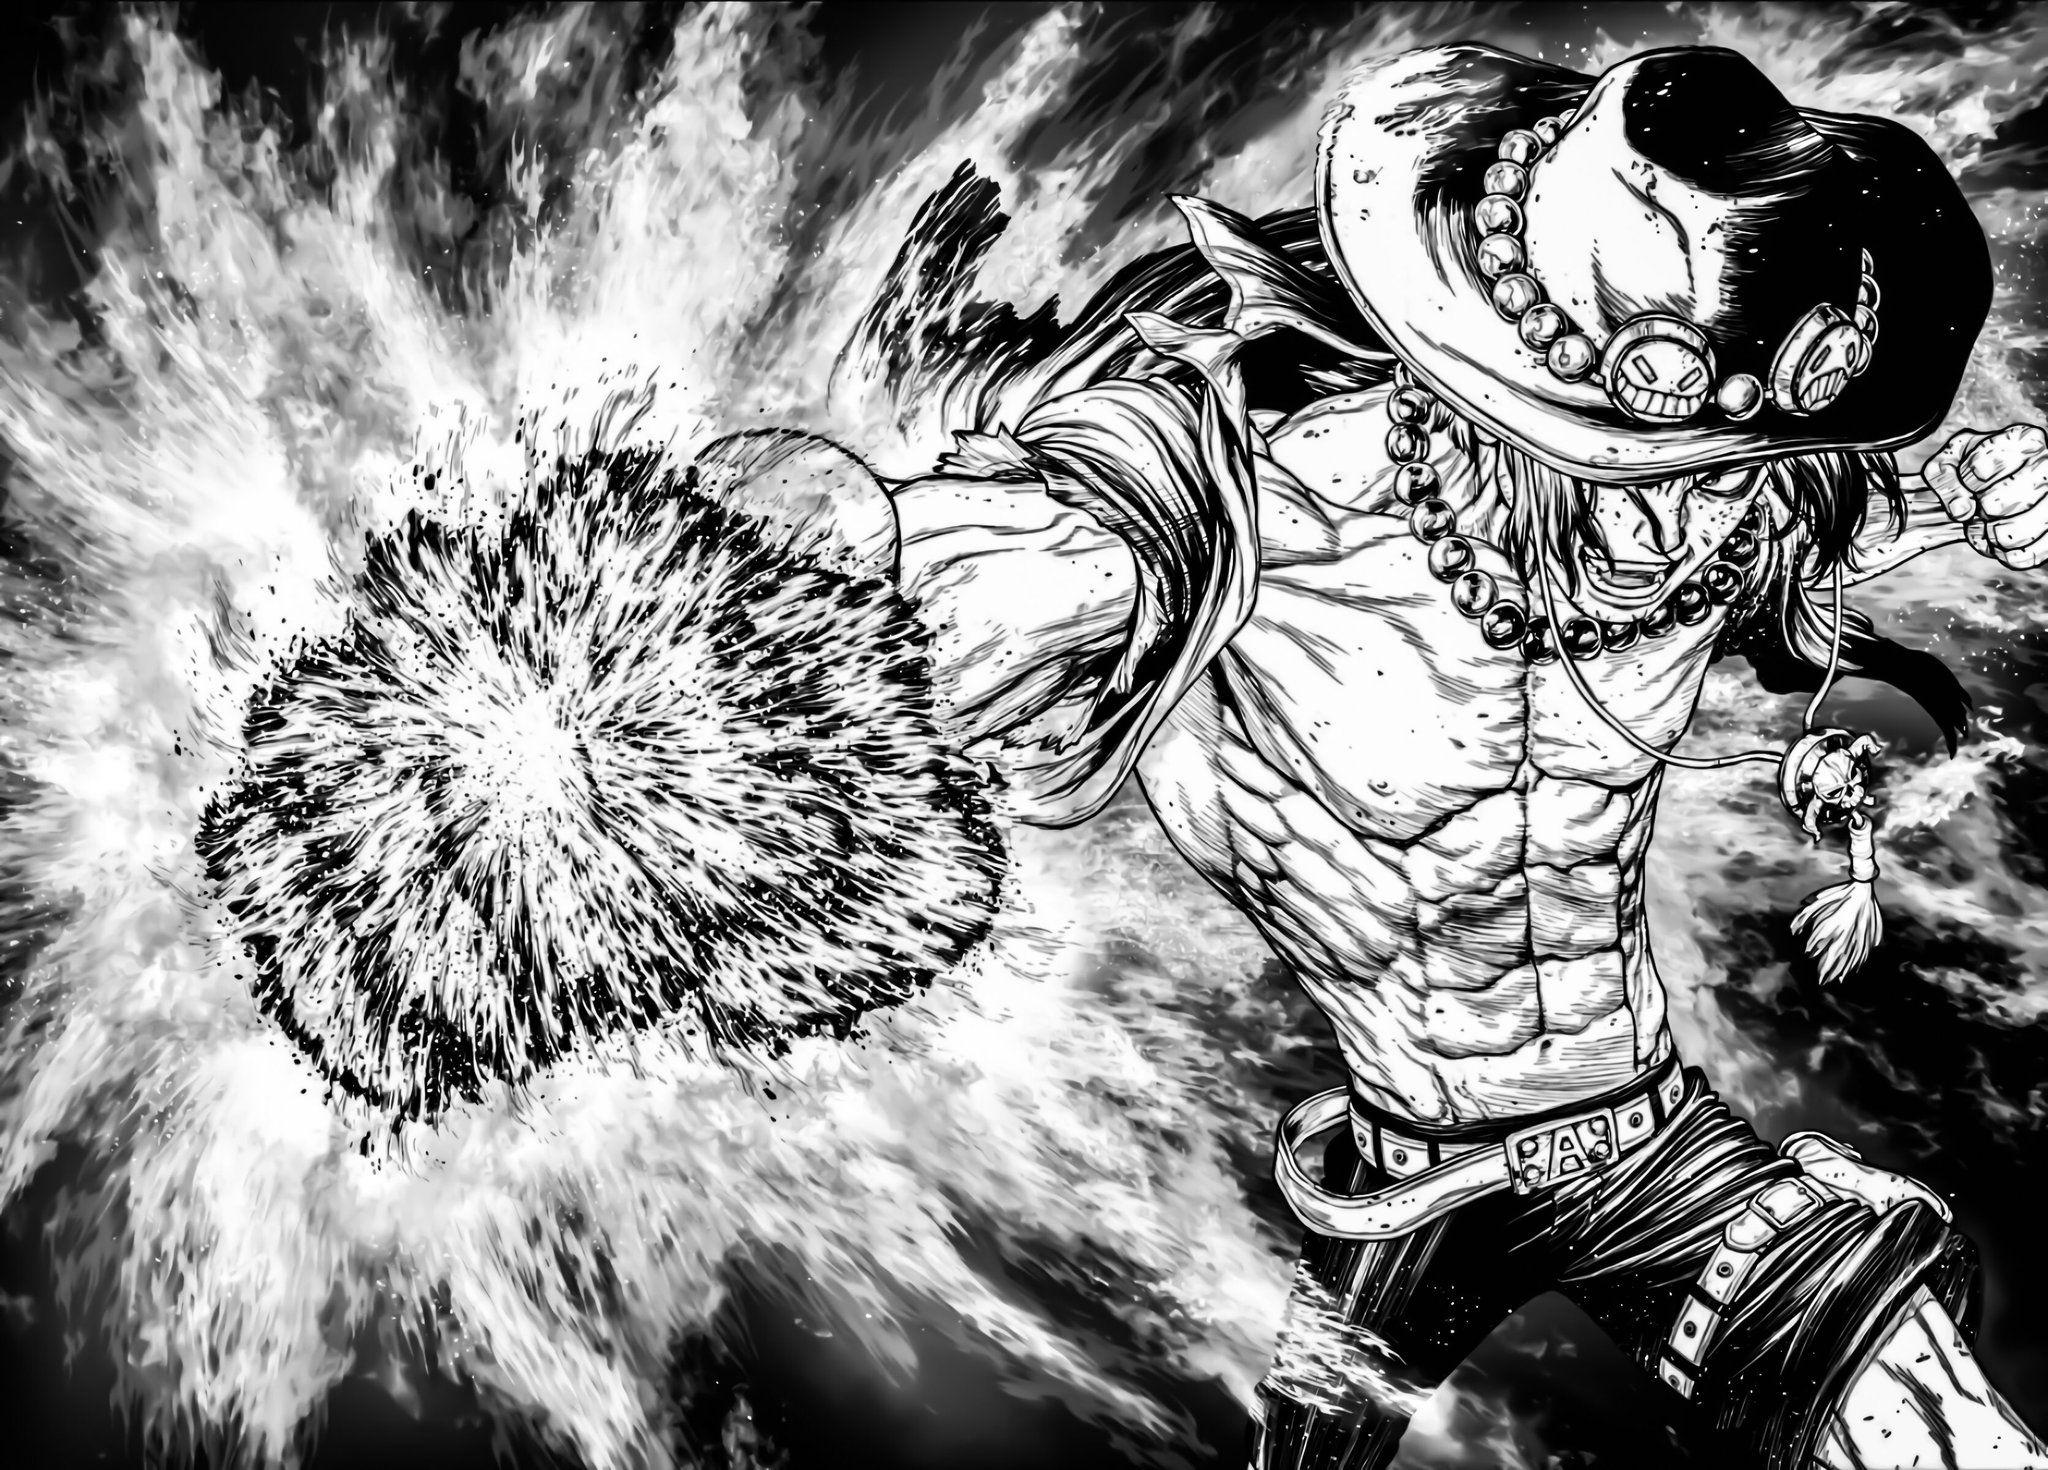 Manga Panels On Twitter In 2021 Manga Anime One Piece Ace Manga One Piece Ace